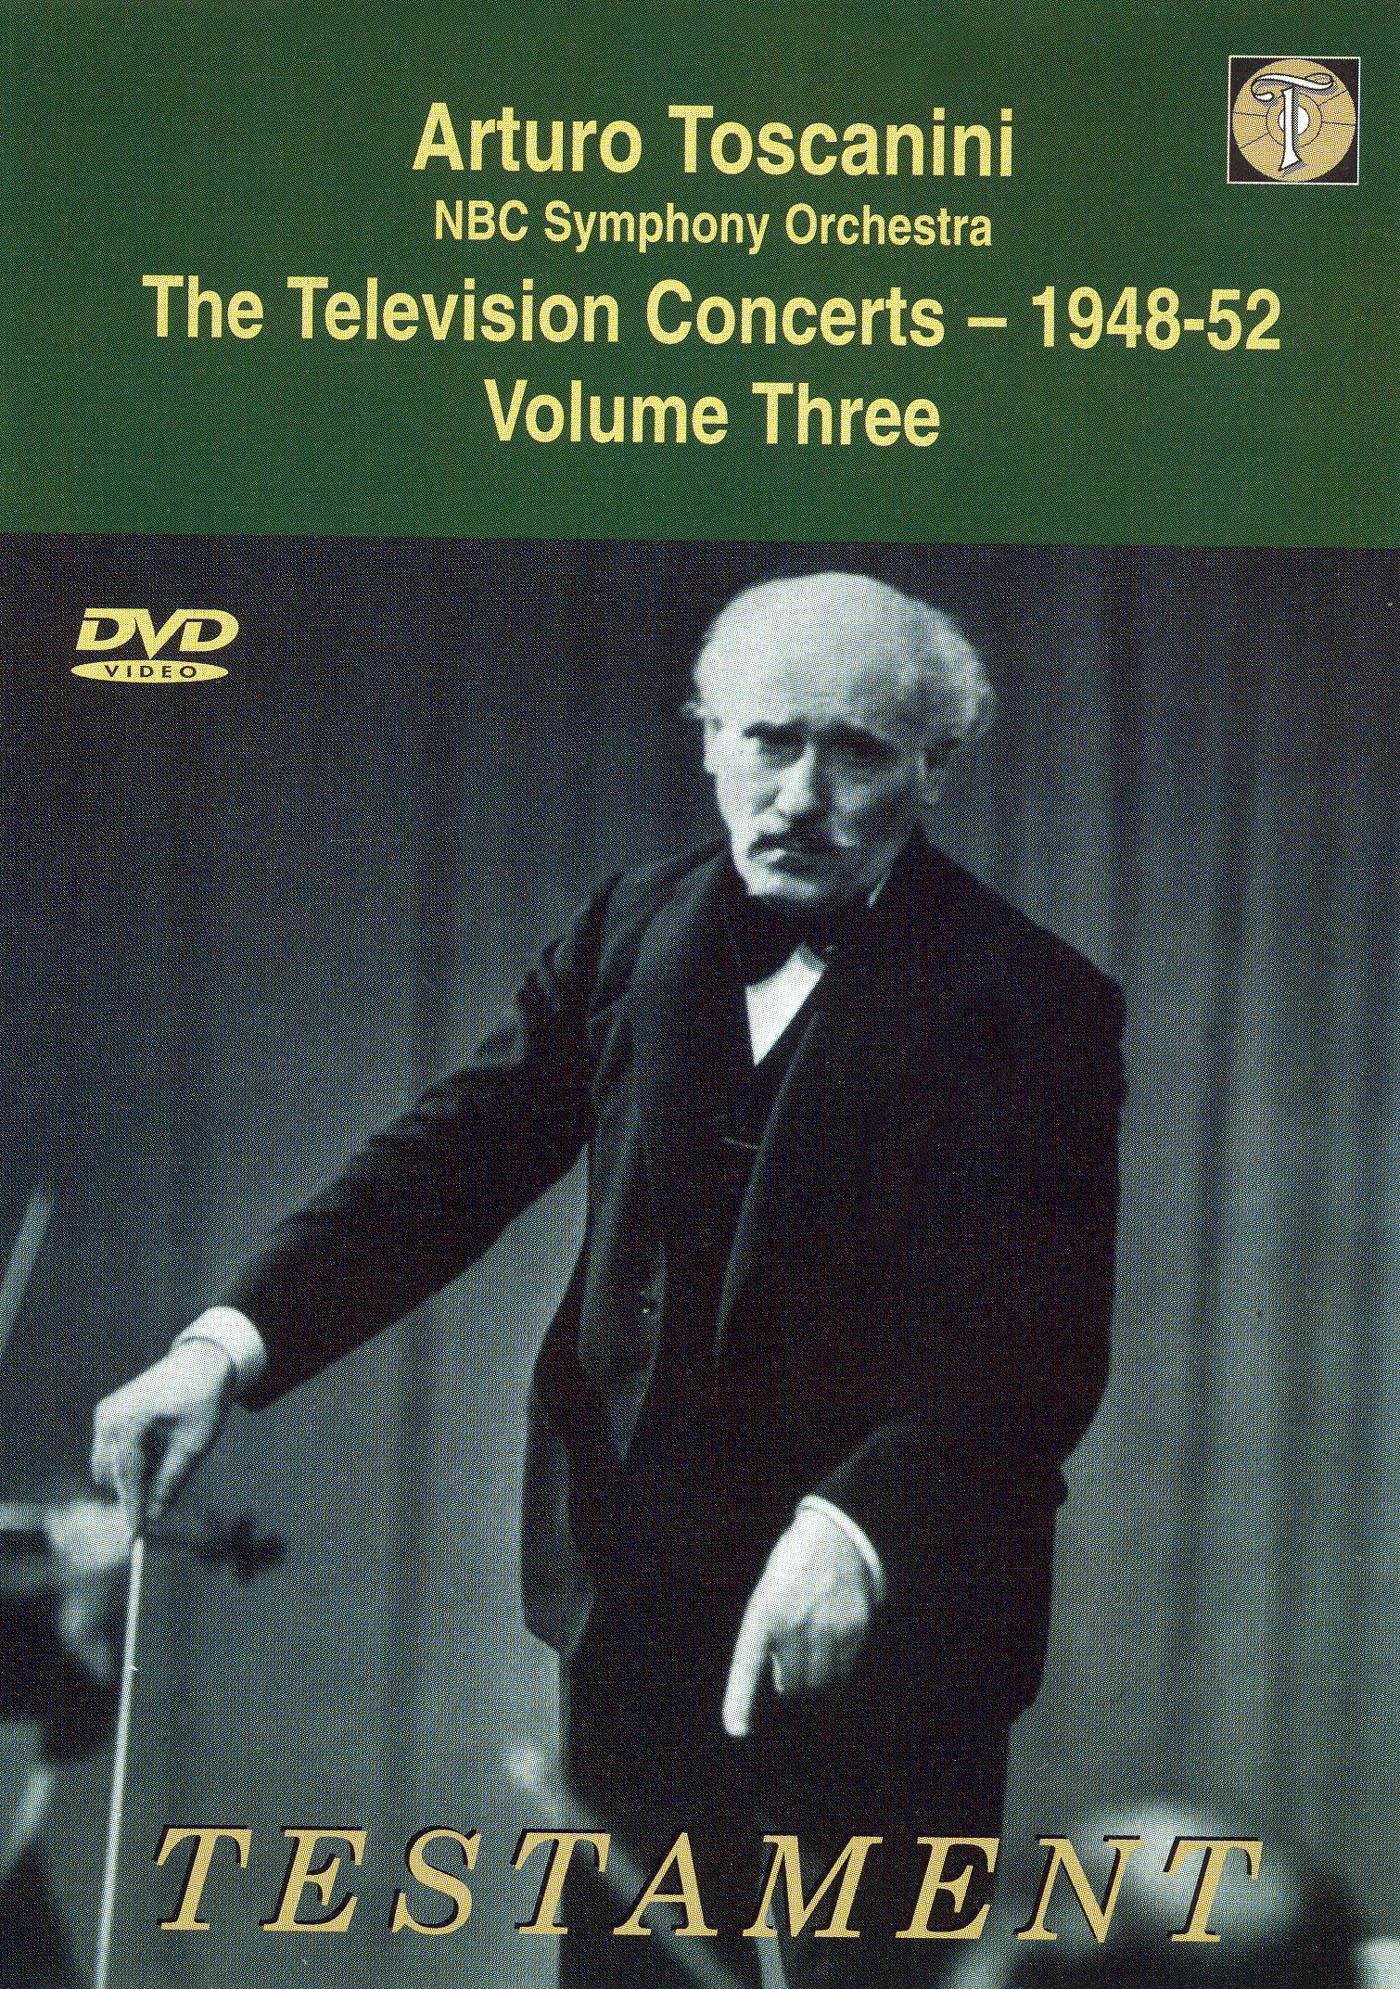 Arturo Toscanini and the NBC Symphony Orchestra: 03/26/1949 & 04/02/1949